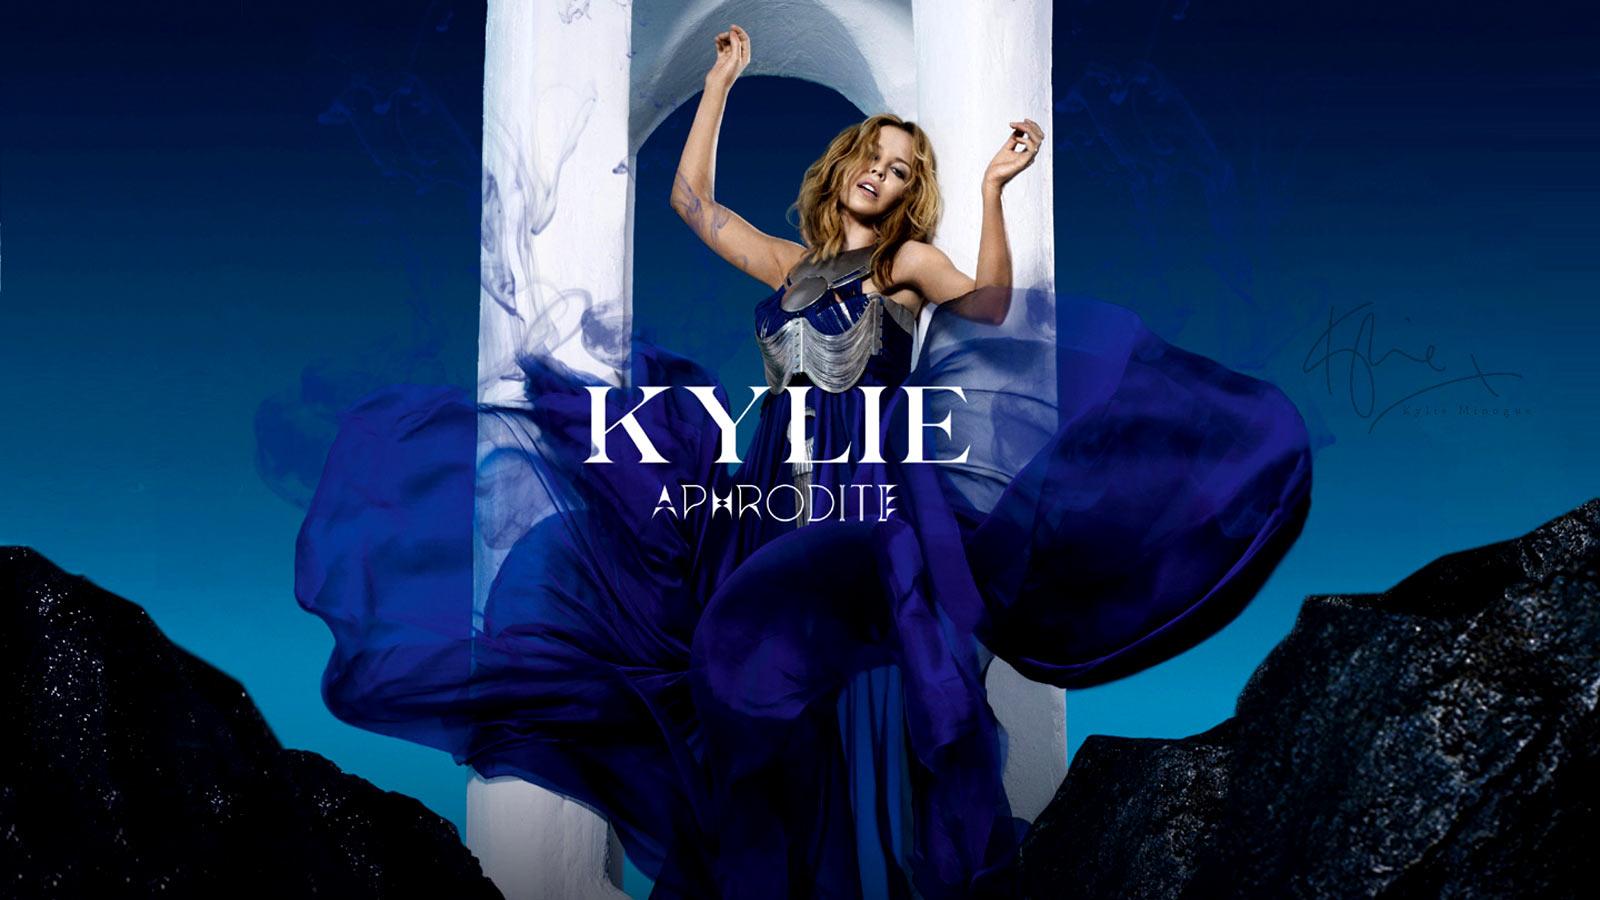 Kylie Minogue Aphrodite Wallpaper 4 1600x900